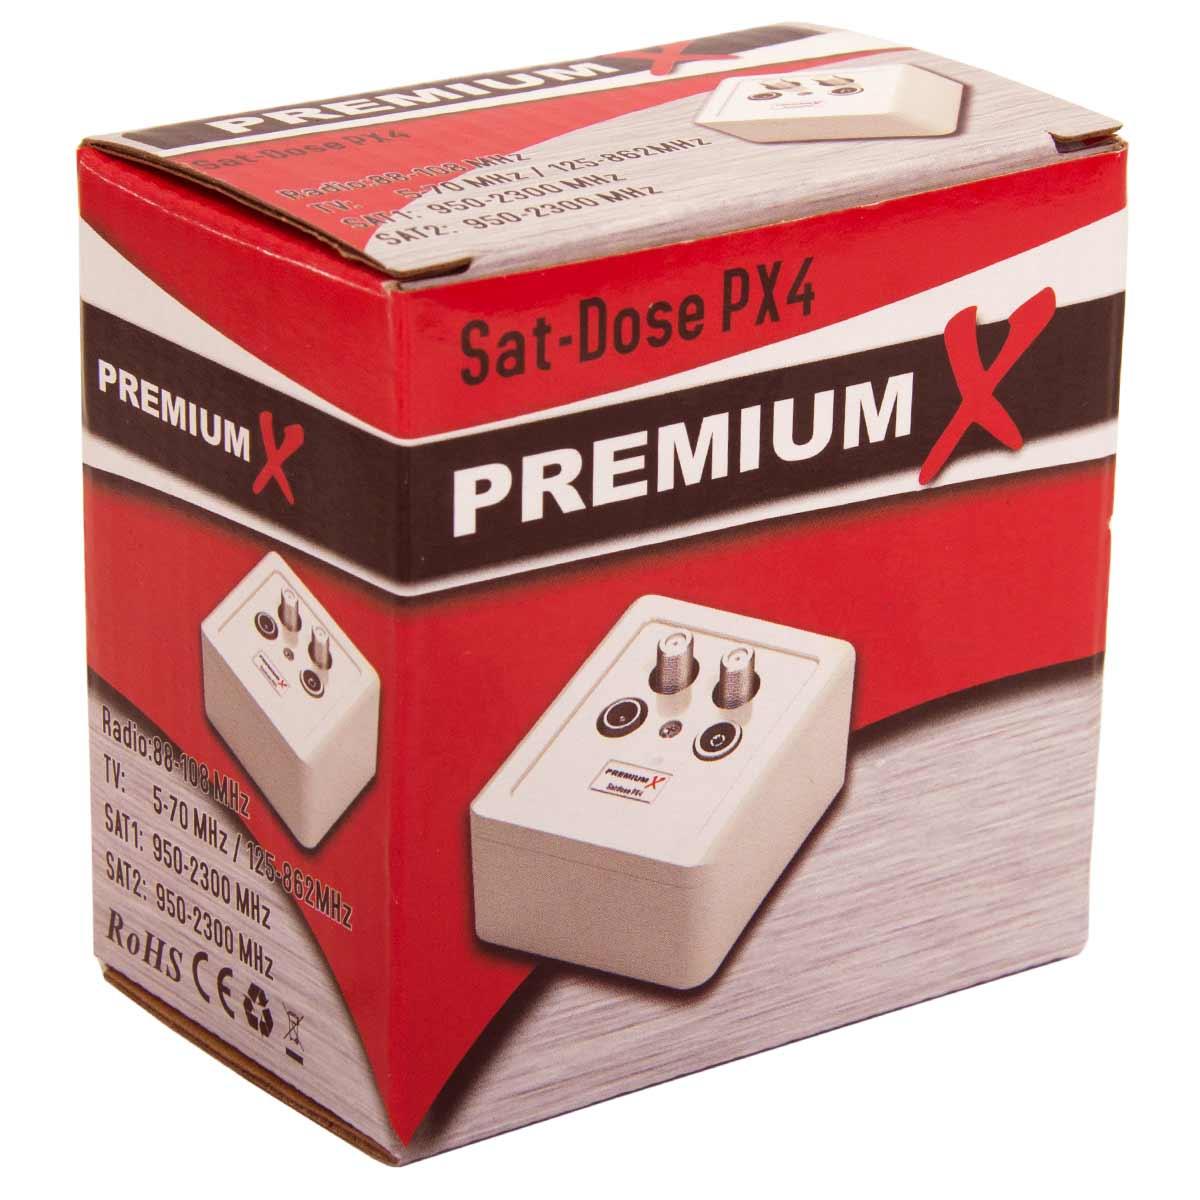 15x PremiumX PX-4 Sat Dose 4 Fach Enddose TWIN Antennendose CLASS A 2x Sat, 1x Radio, 1xTV DIGITAL FULLHD 3D